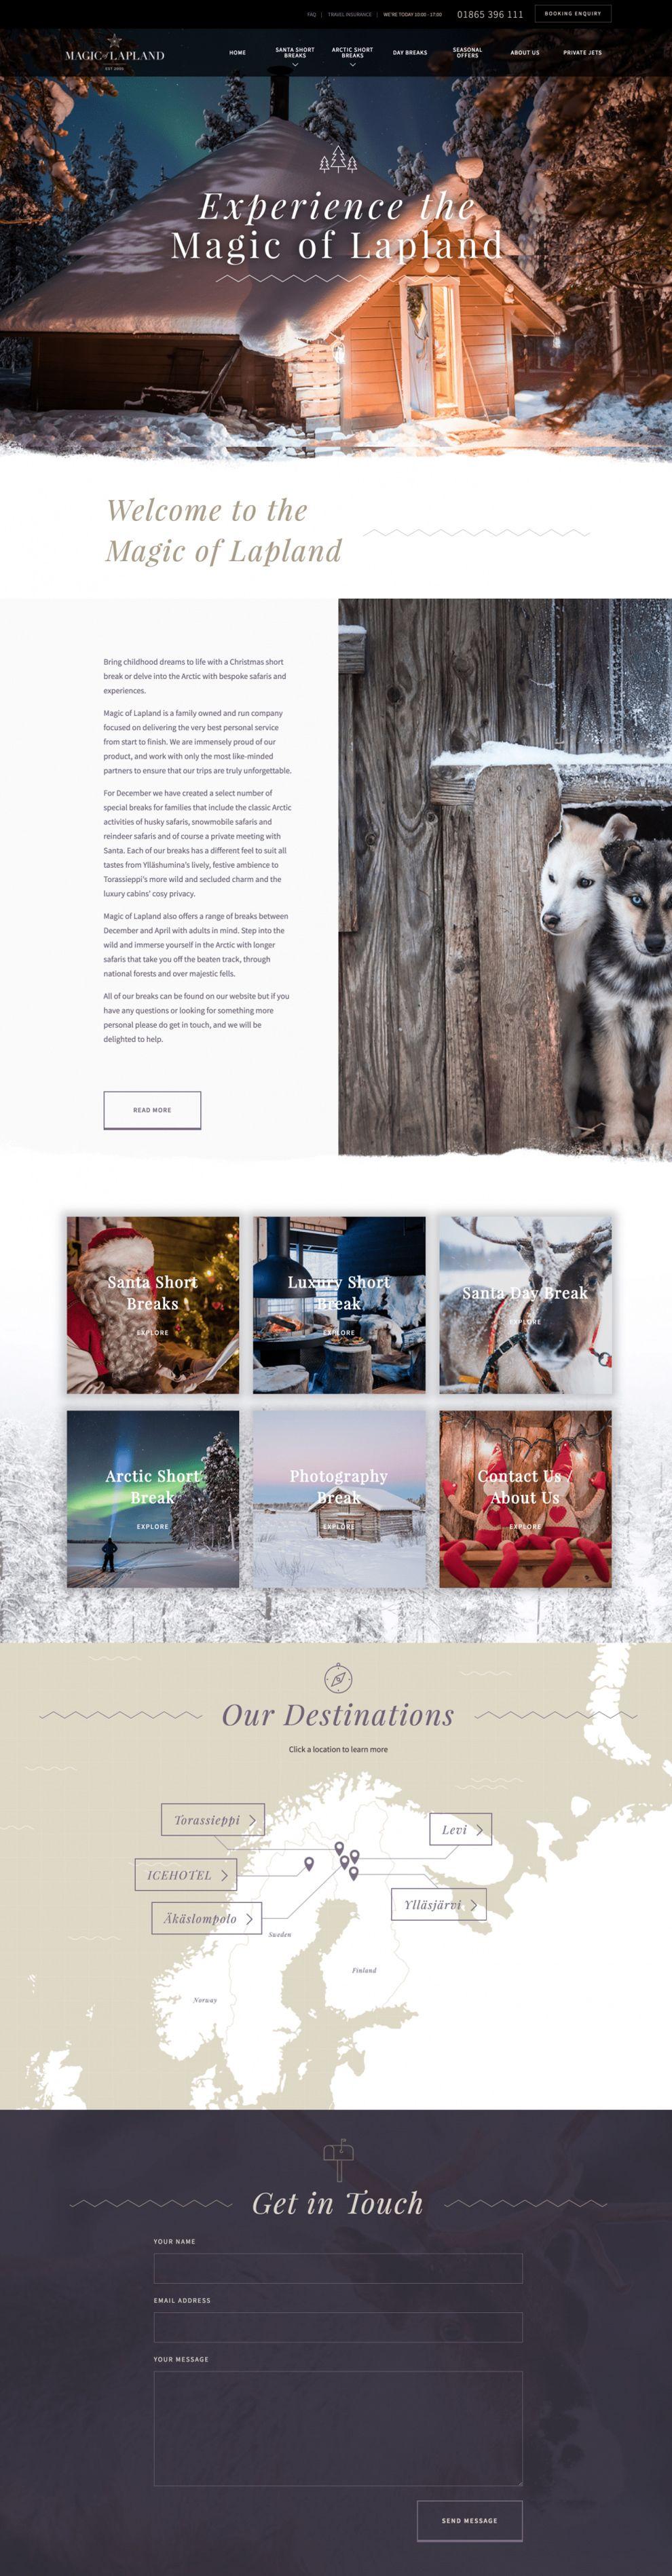 Magic Of Lapland Beautiful Homepage